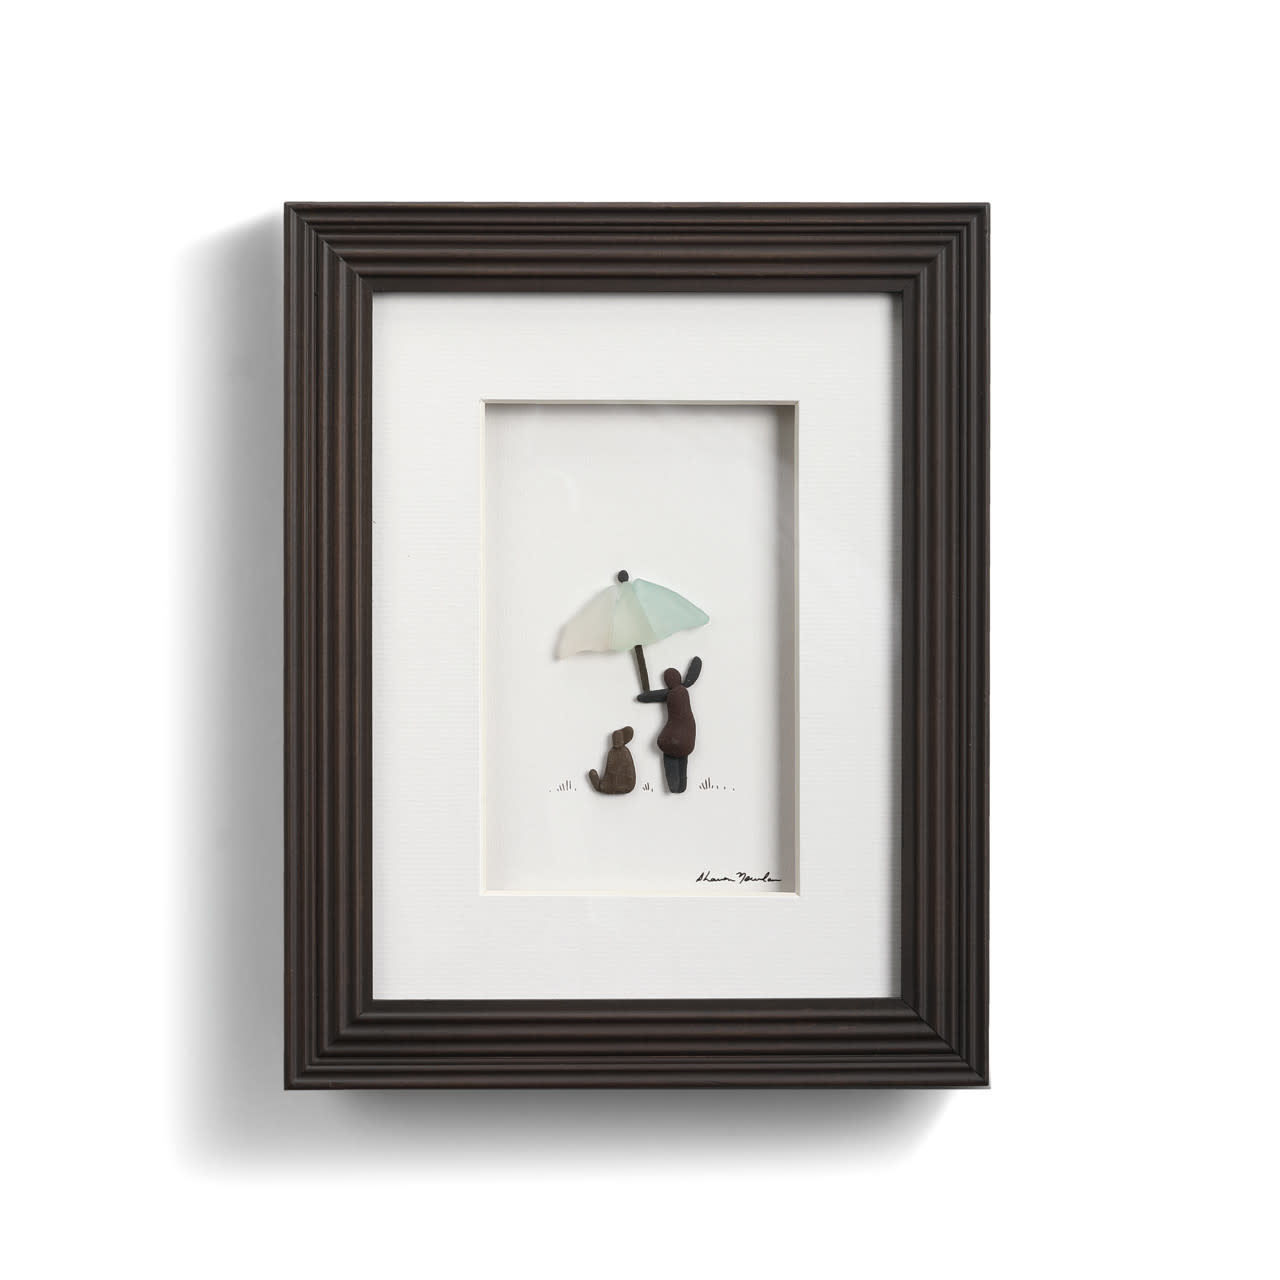 Fleurish Home Umbrella for Sharing (Child and Dog) Pebble Art 8x10